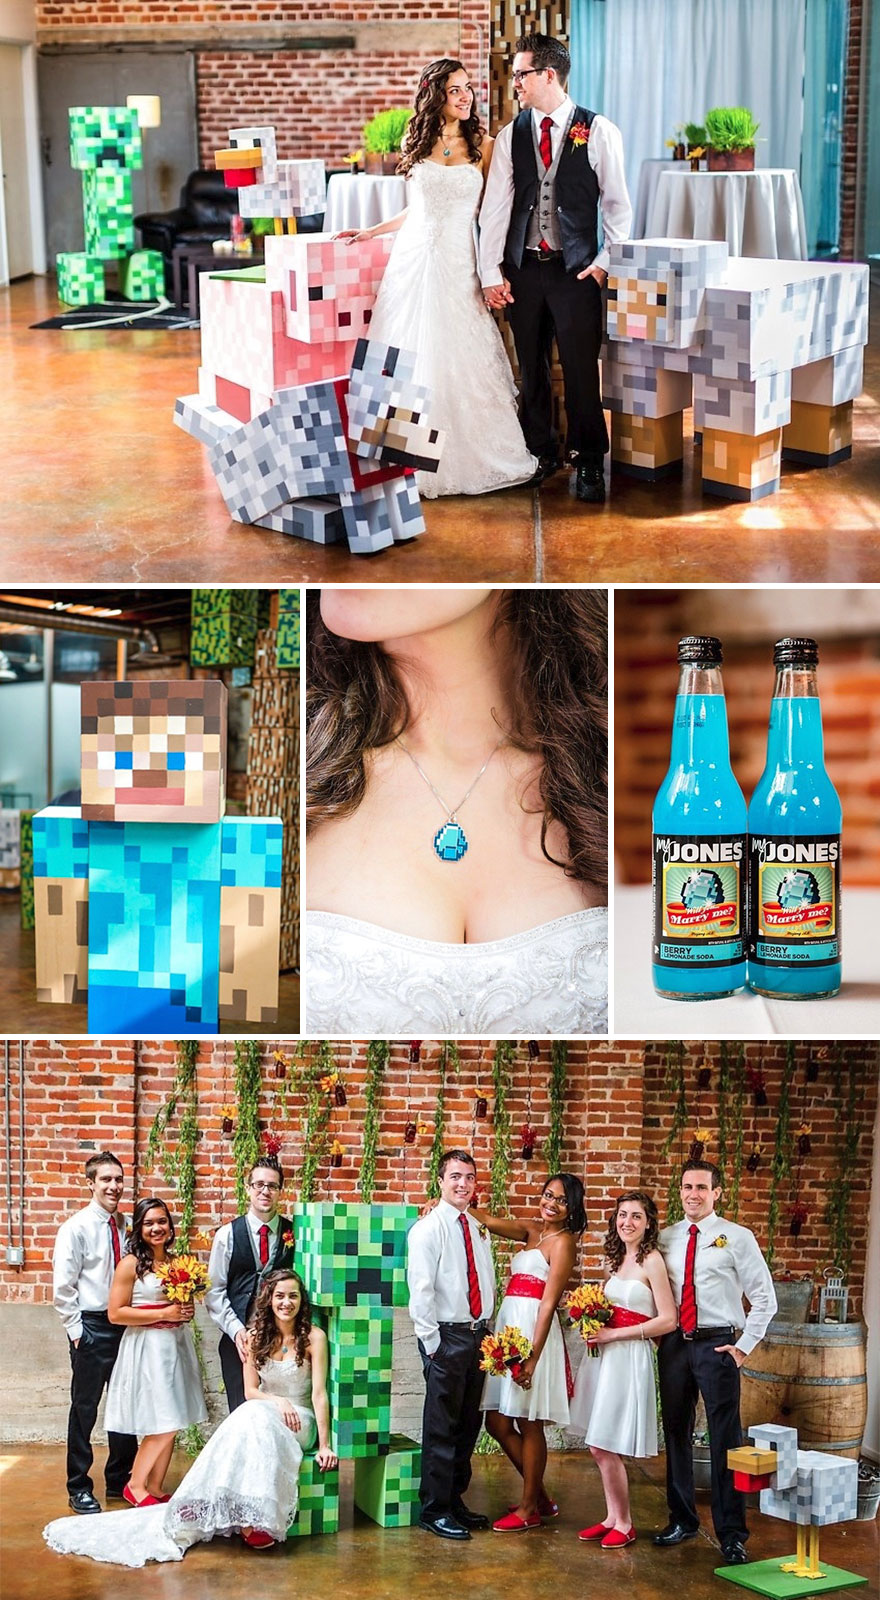 geeky-themed-creative-wedding-5